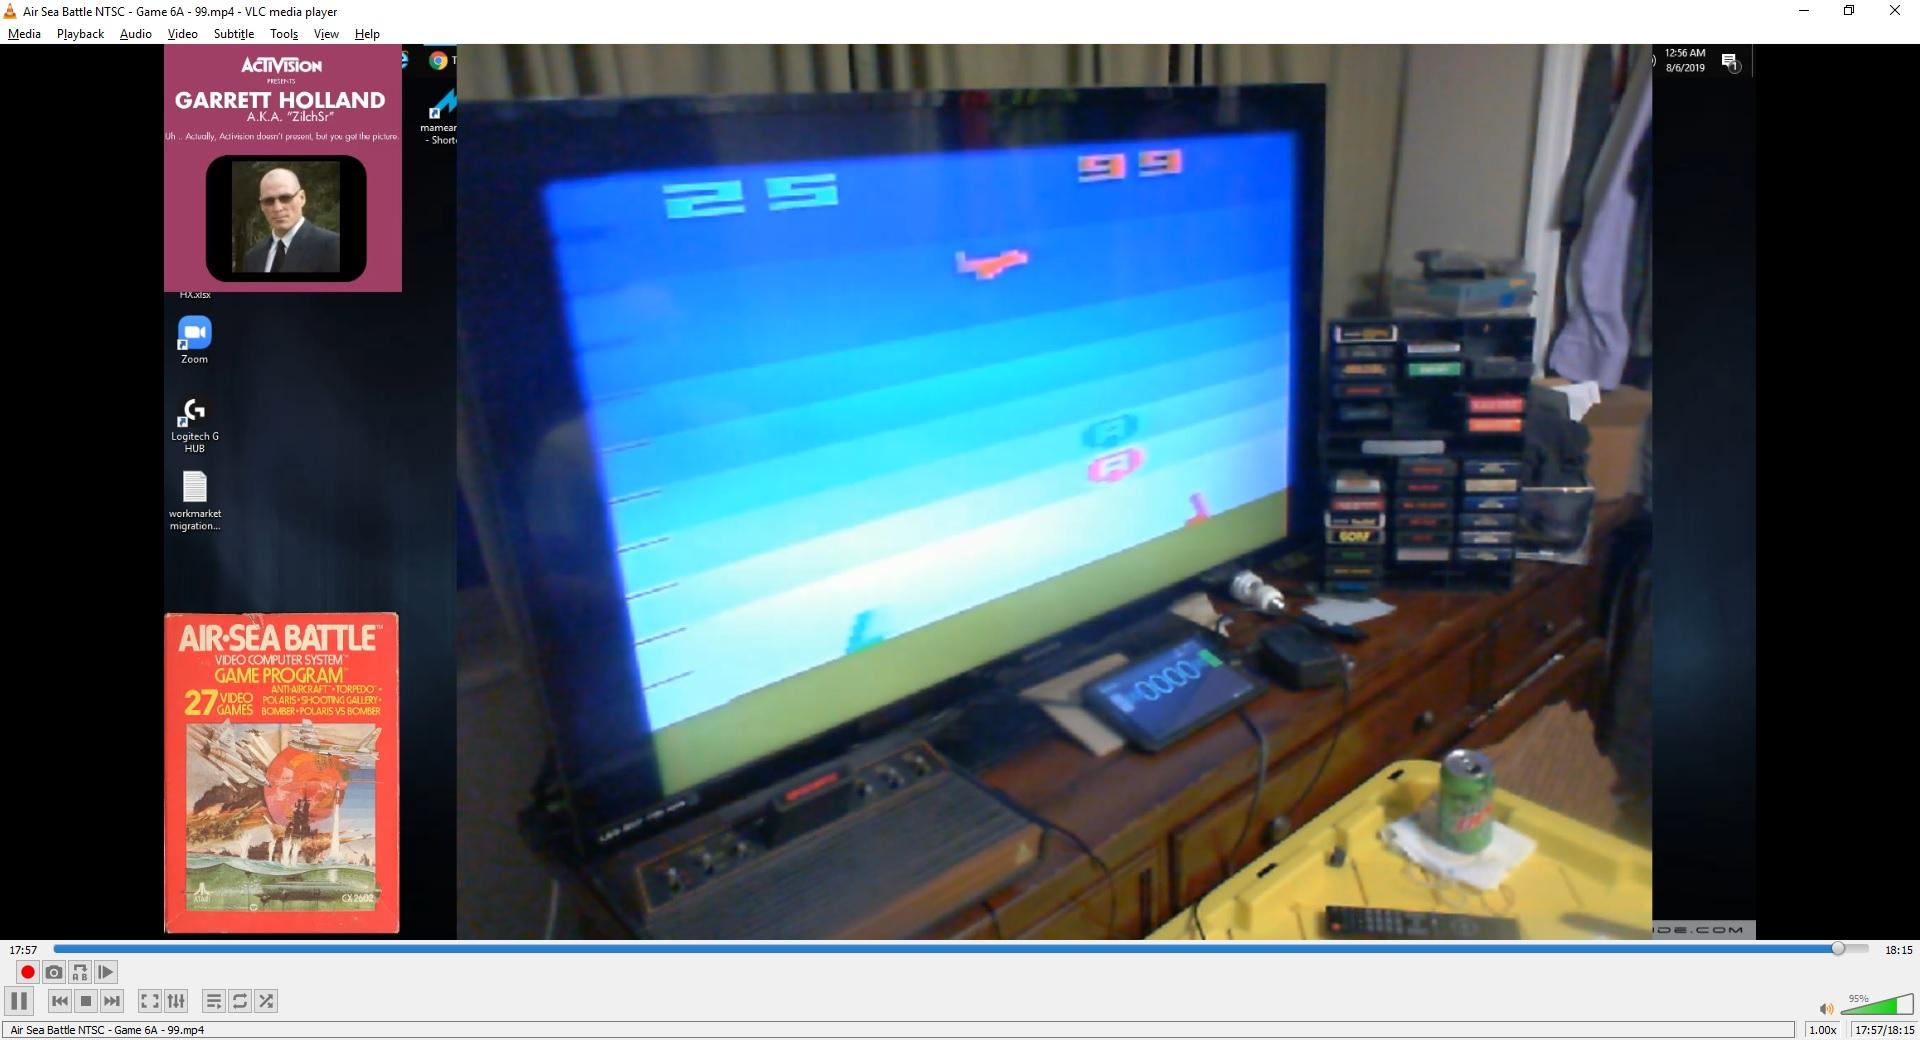 ZilchSr: Air-Sea Battle: Game 6 (Atari 2600 Expert/A) 99 points on 2019-10-10 19:00:00